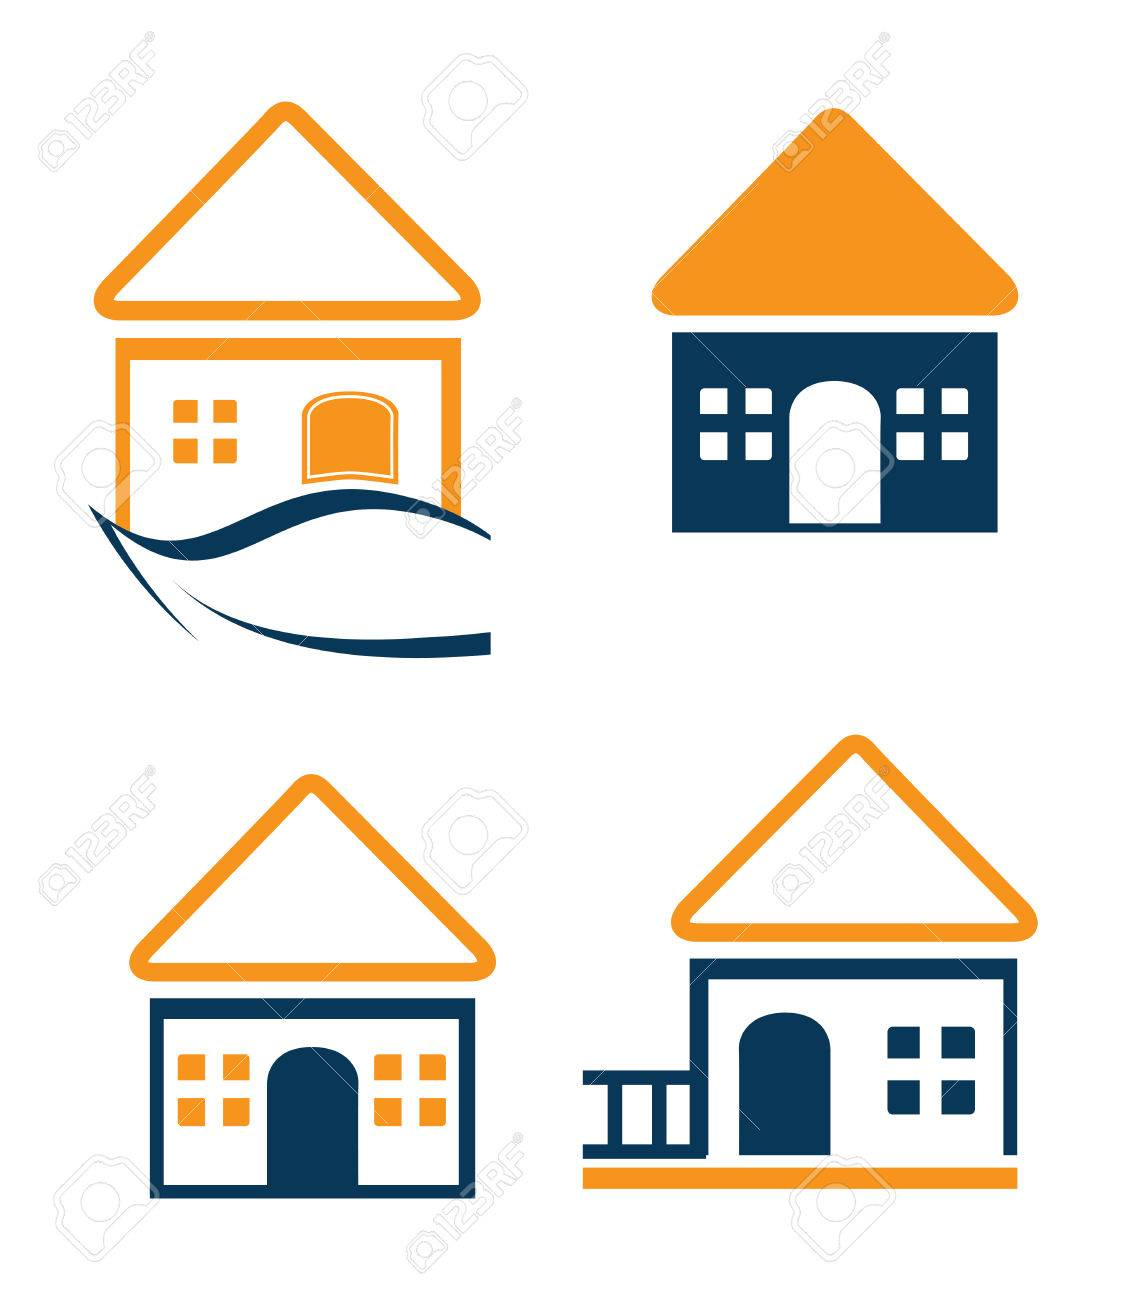 Home Design Over White Background, Vector Illustration Stock Vector    26728915